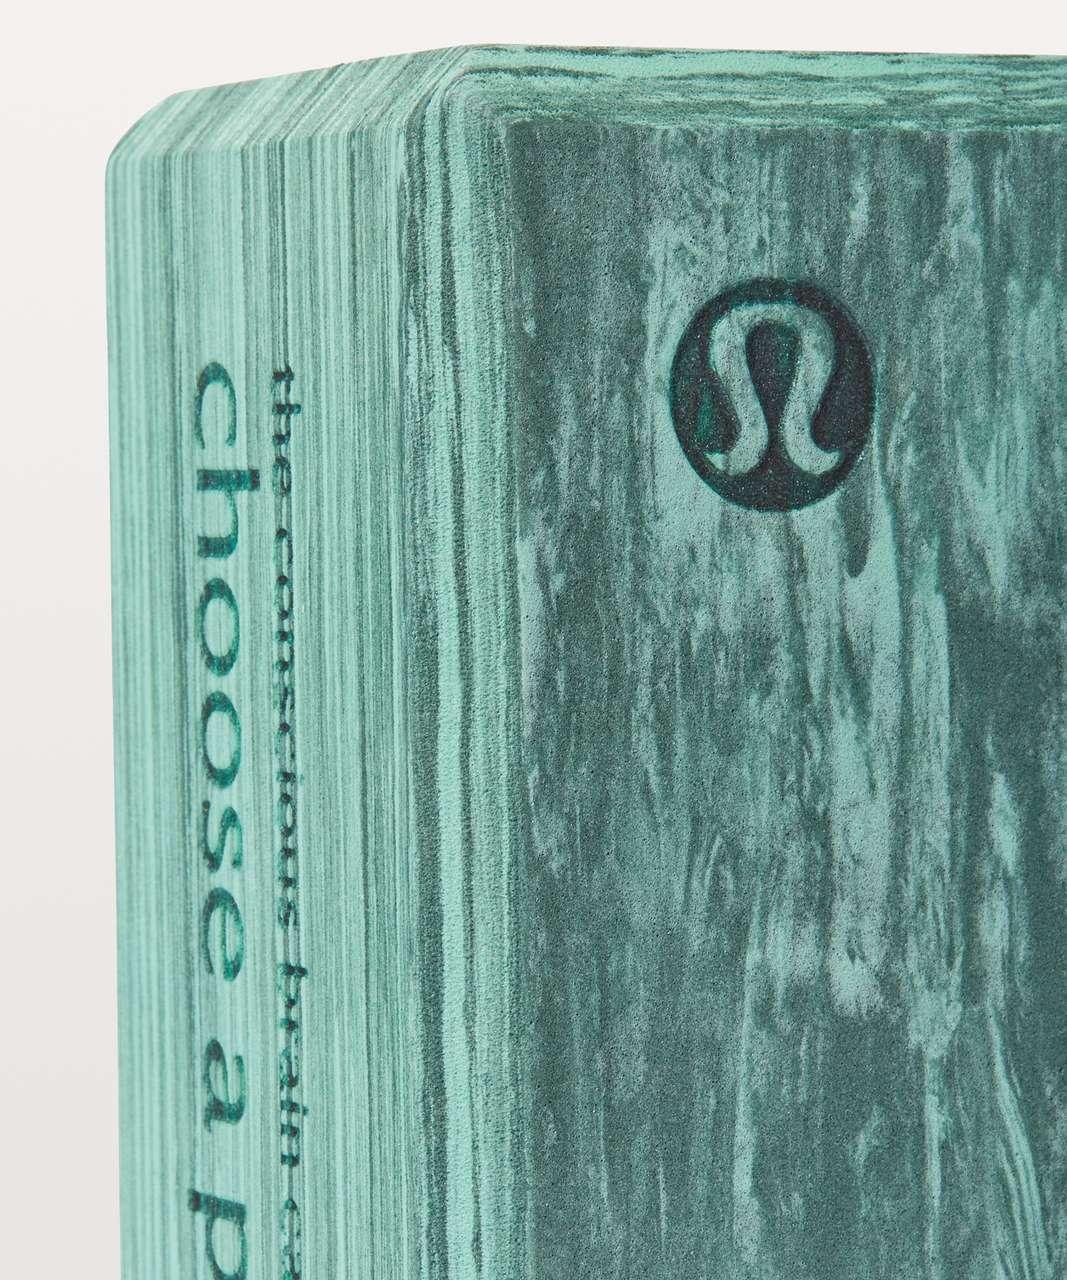 Lululemon Lift & Lengthen Yoga Block - Rip Tide / Sea Steel